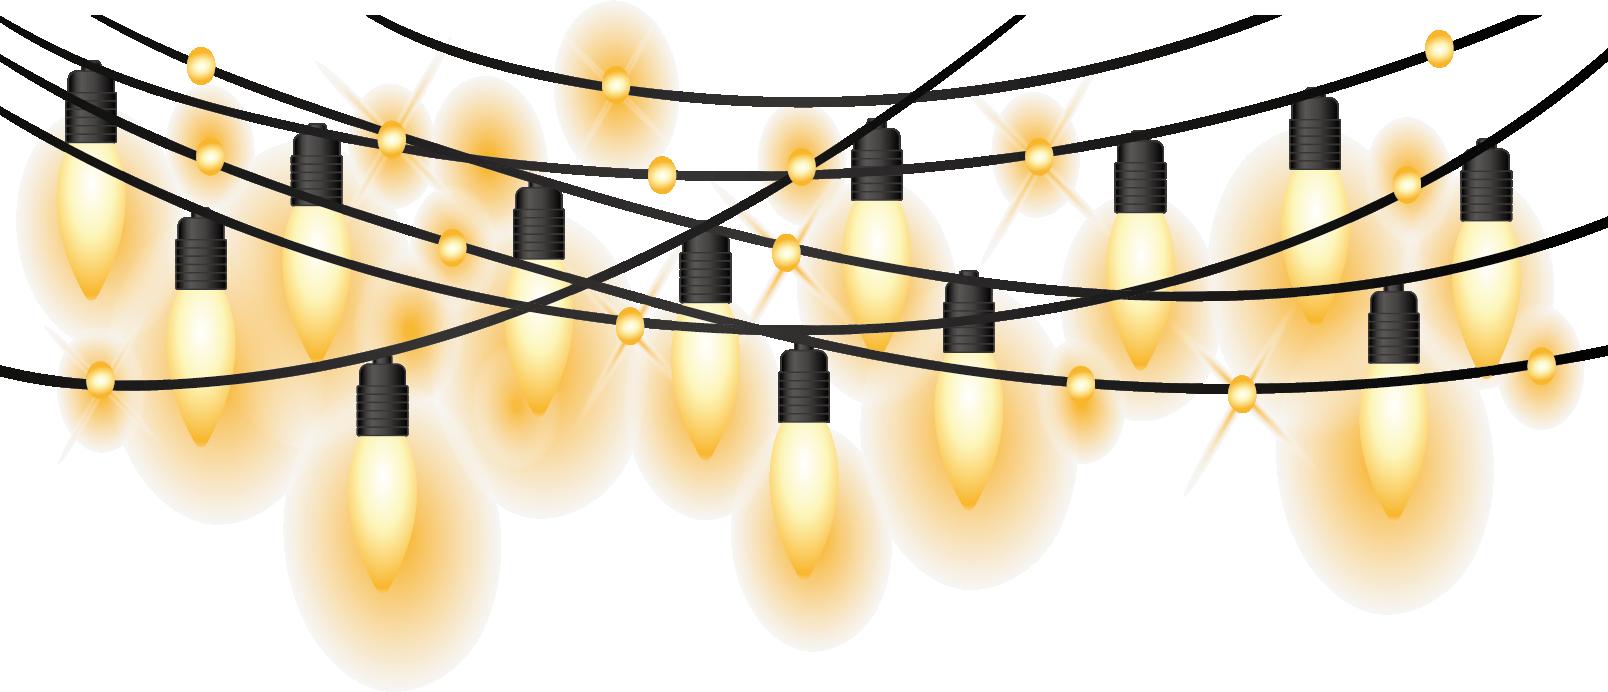 Clipart Lights Transparent Background Png Christmas String.